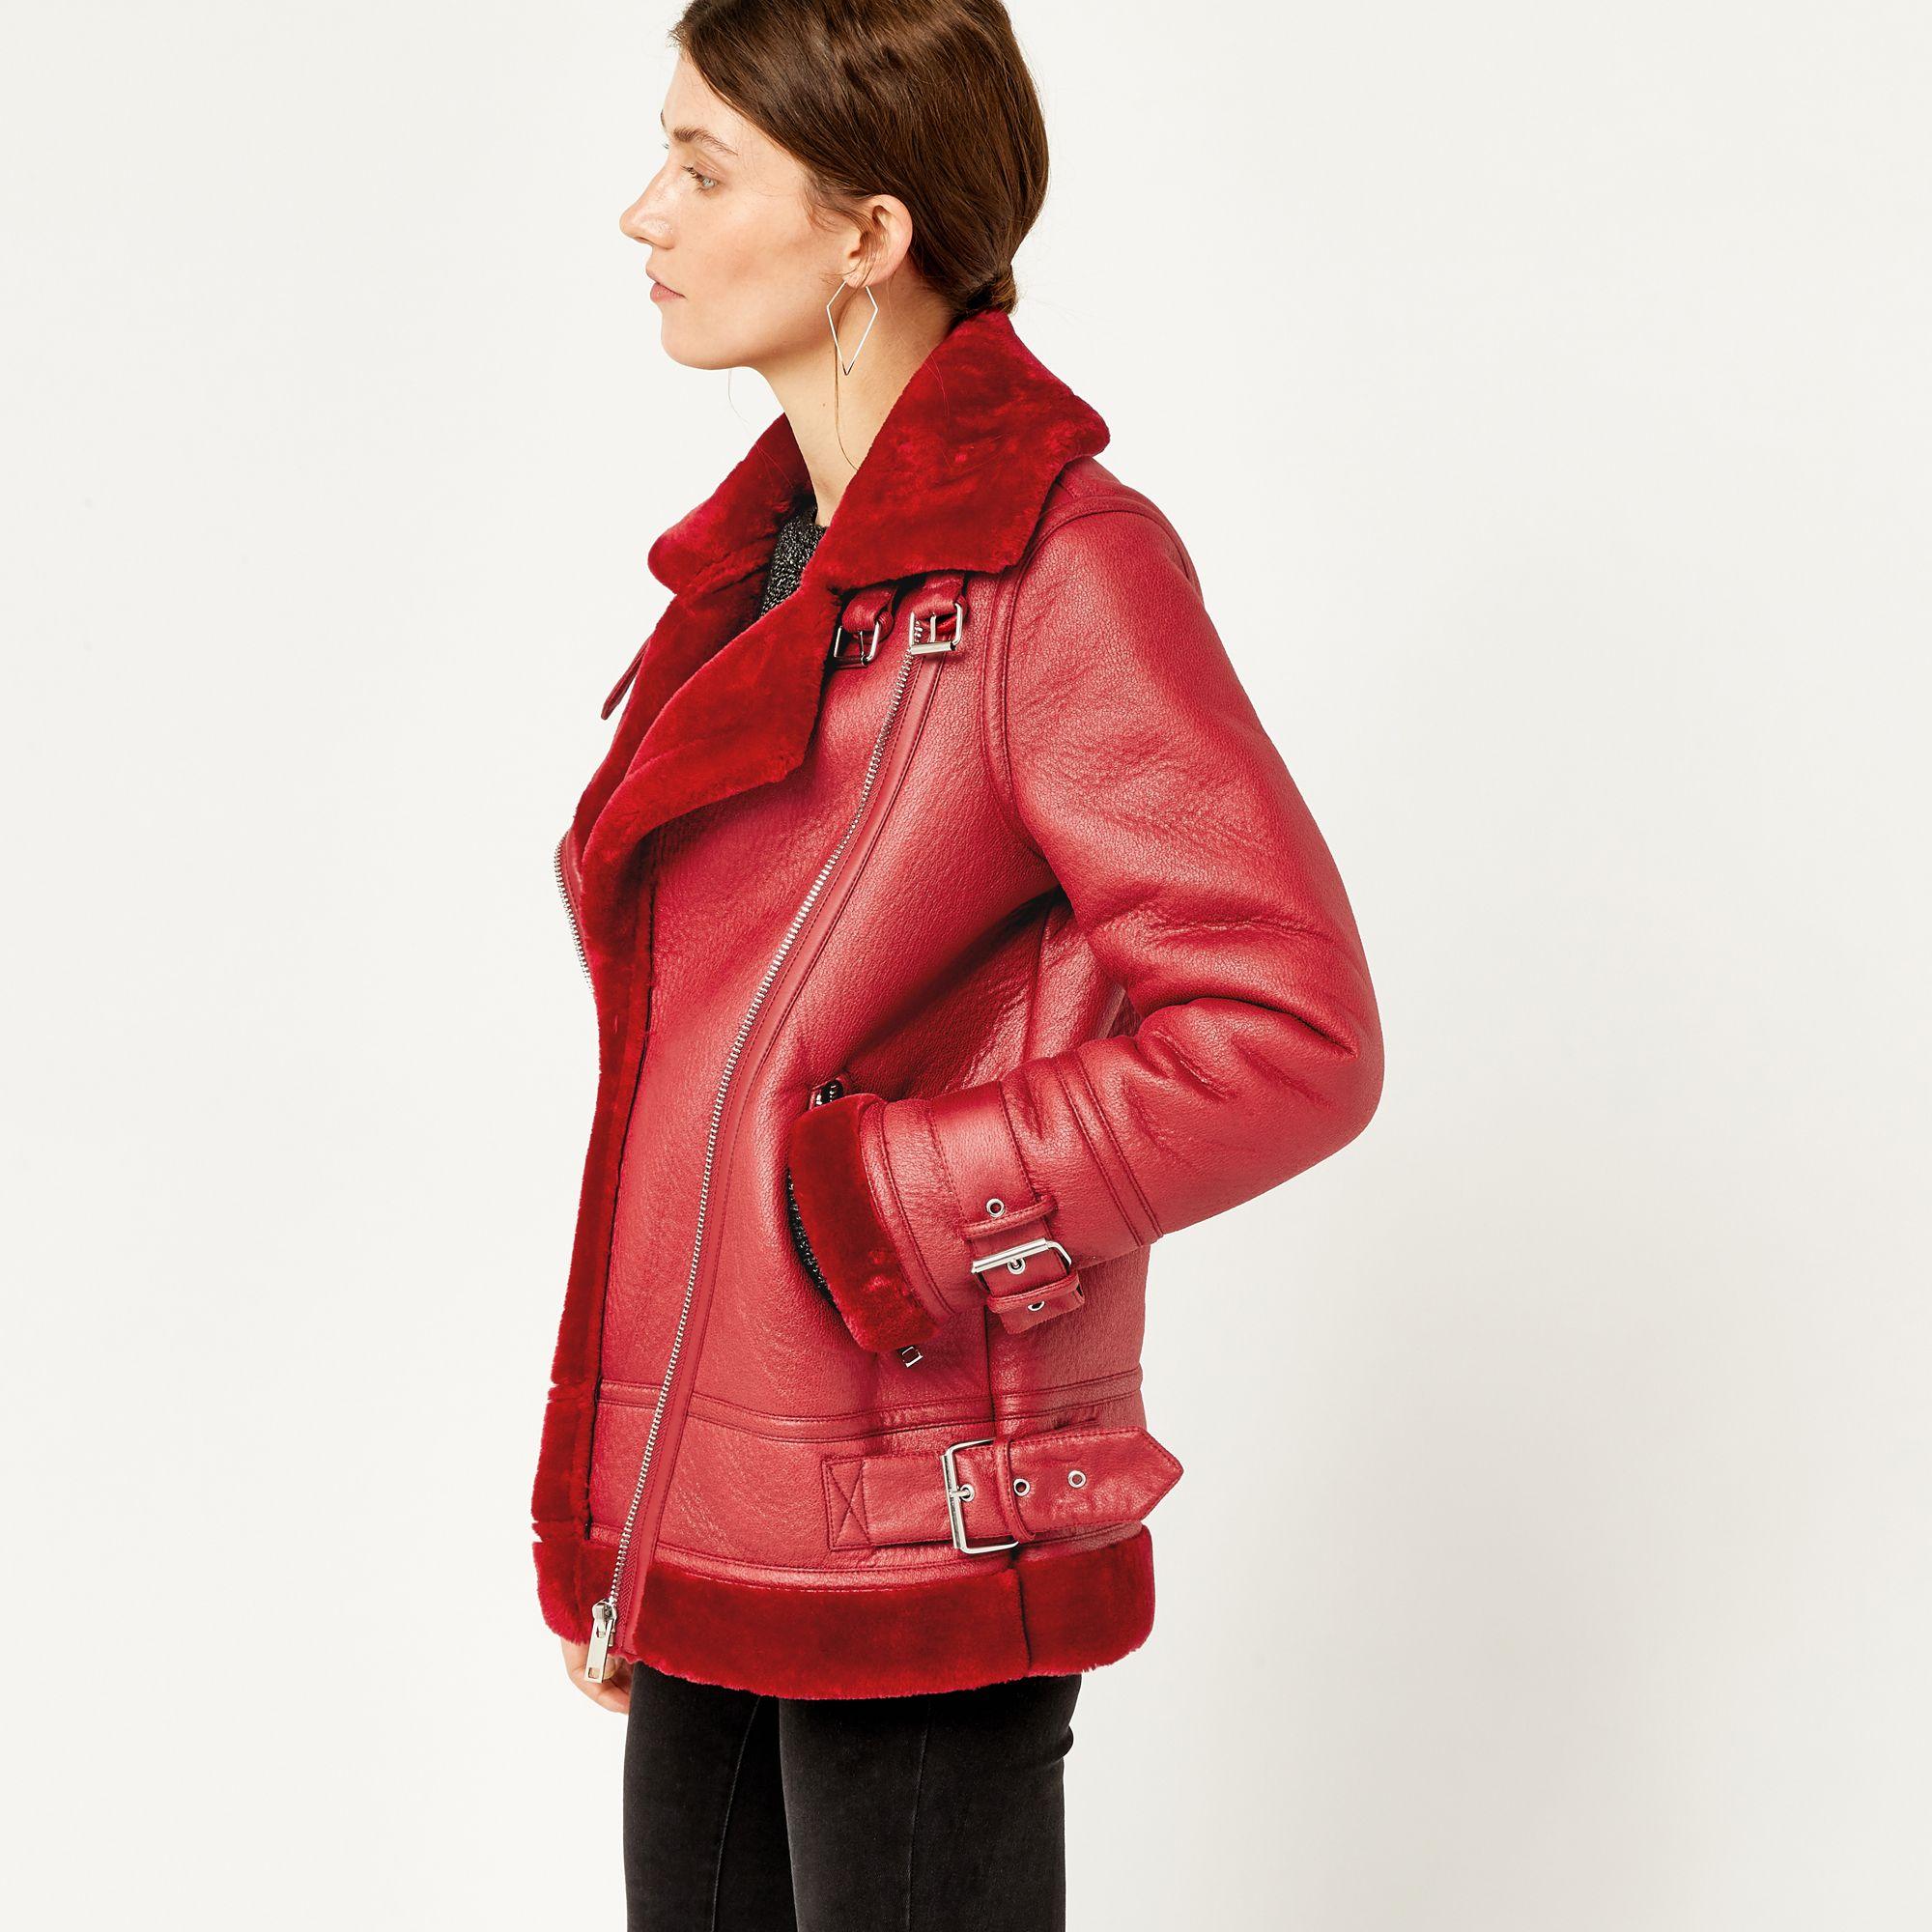 Warehouse, OVERSIZED BIKER JACKET Bright Red 1 Jackets